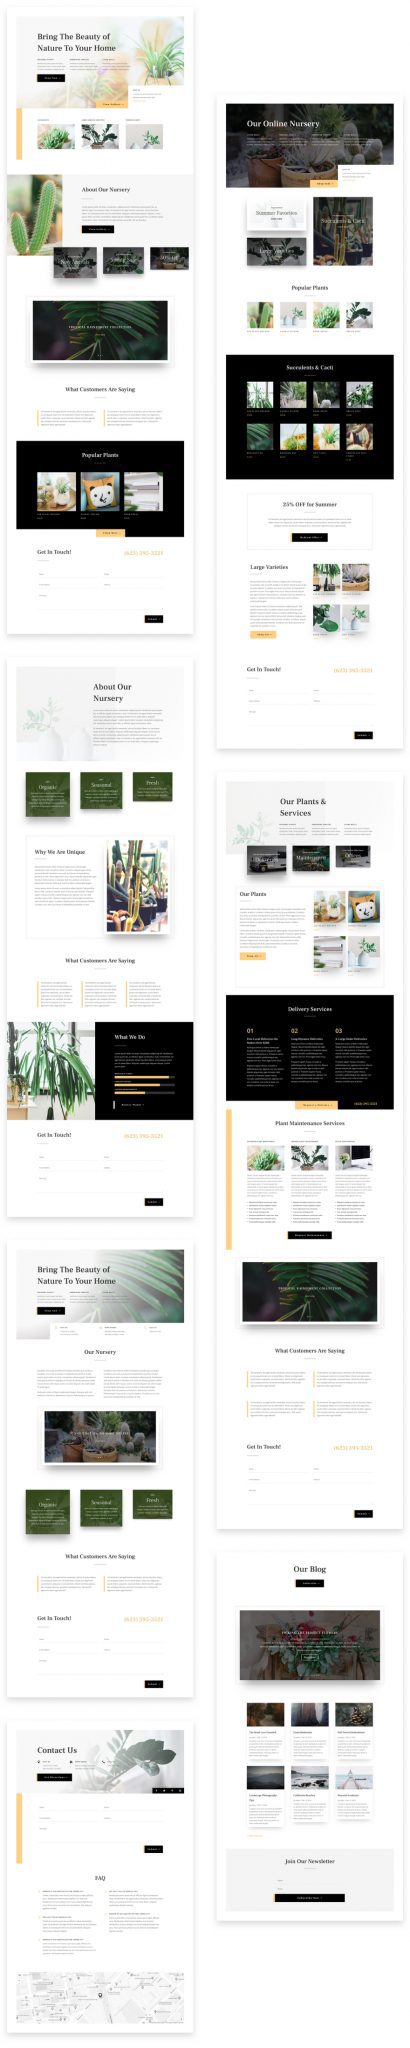 Plant Nursery Layout Pack